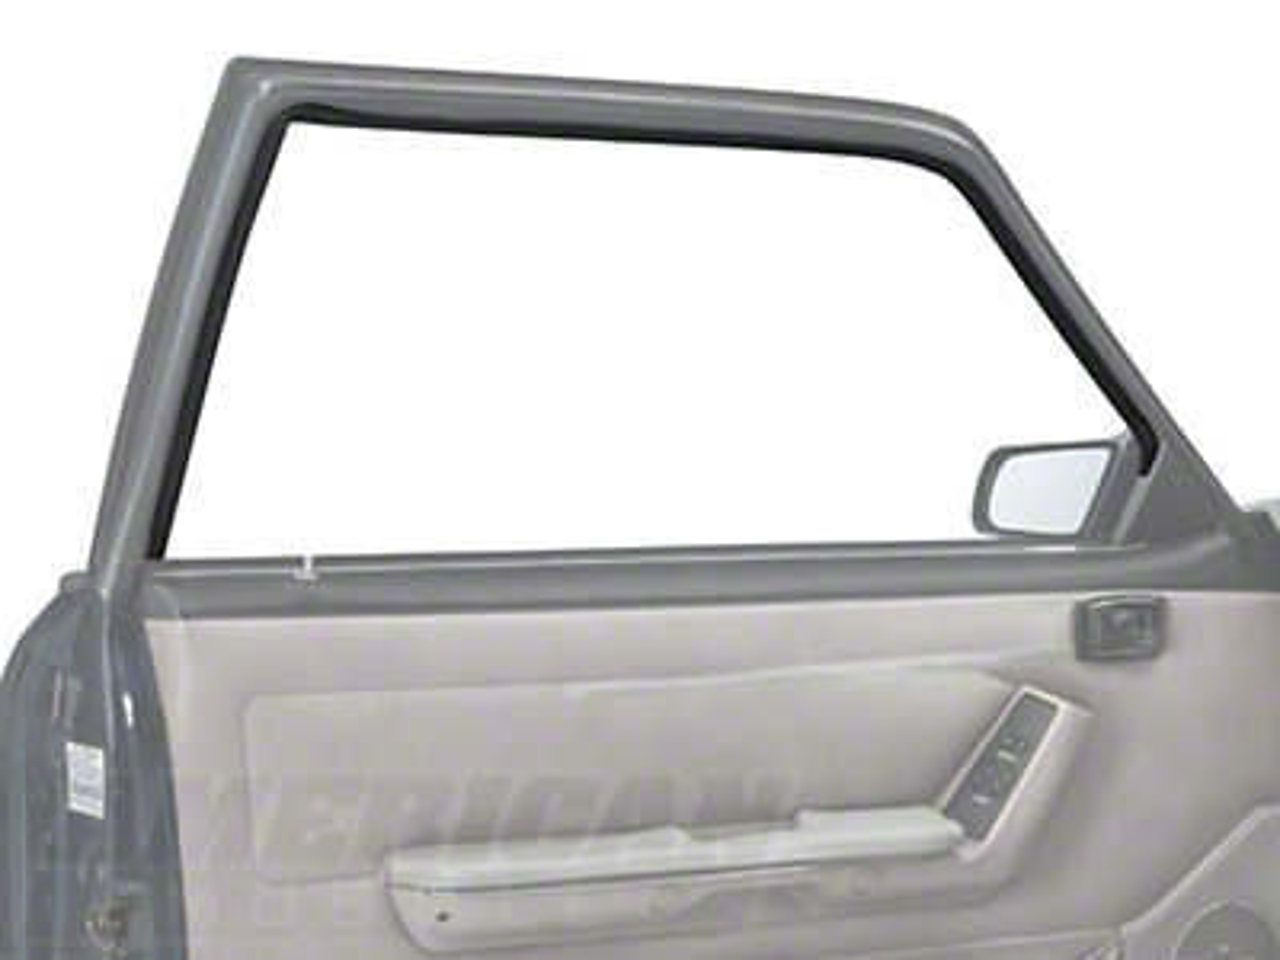 OPR Door Window Run Channel - Driver Side - Coupe, Hatchback (79-93 All)